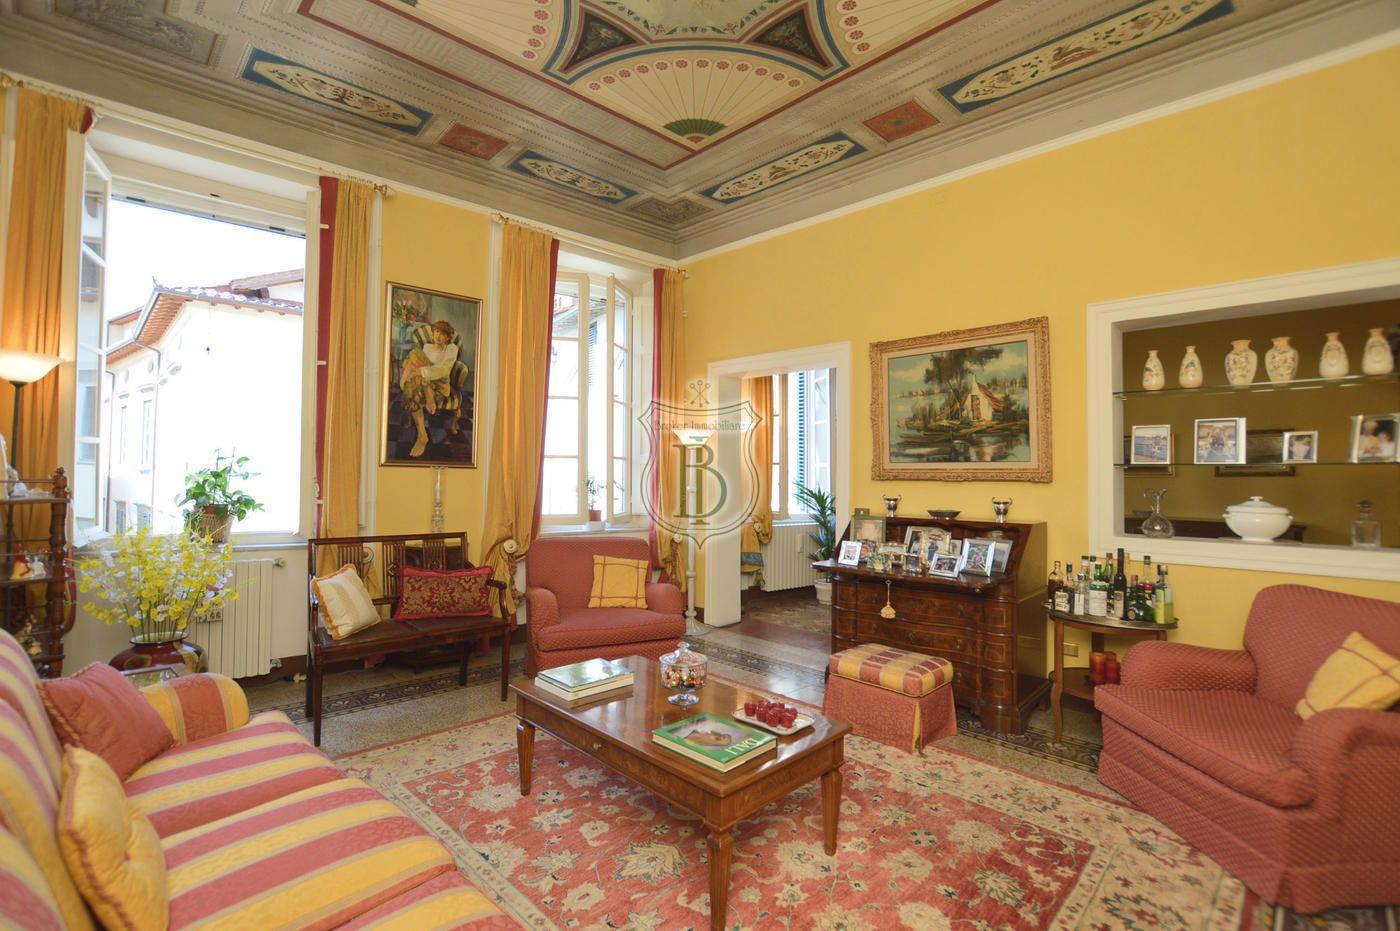 Appartamento in Vendita a Lucca, Lucca, Toscana, Versilia